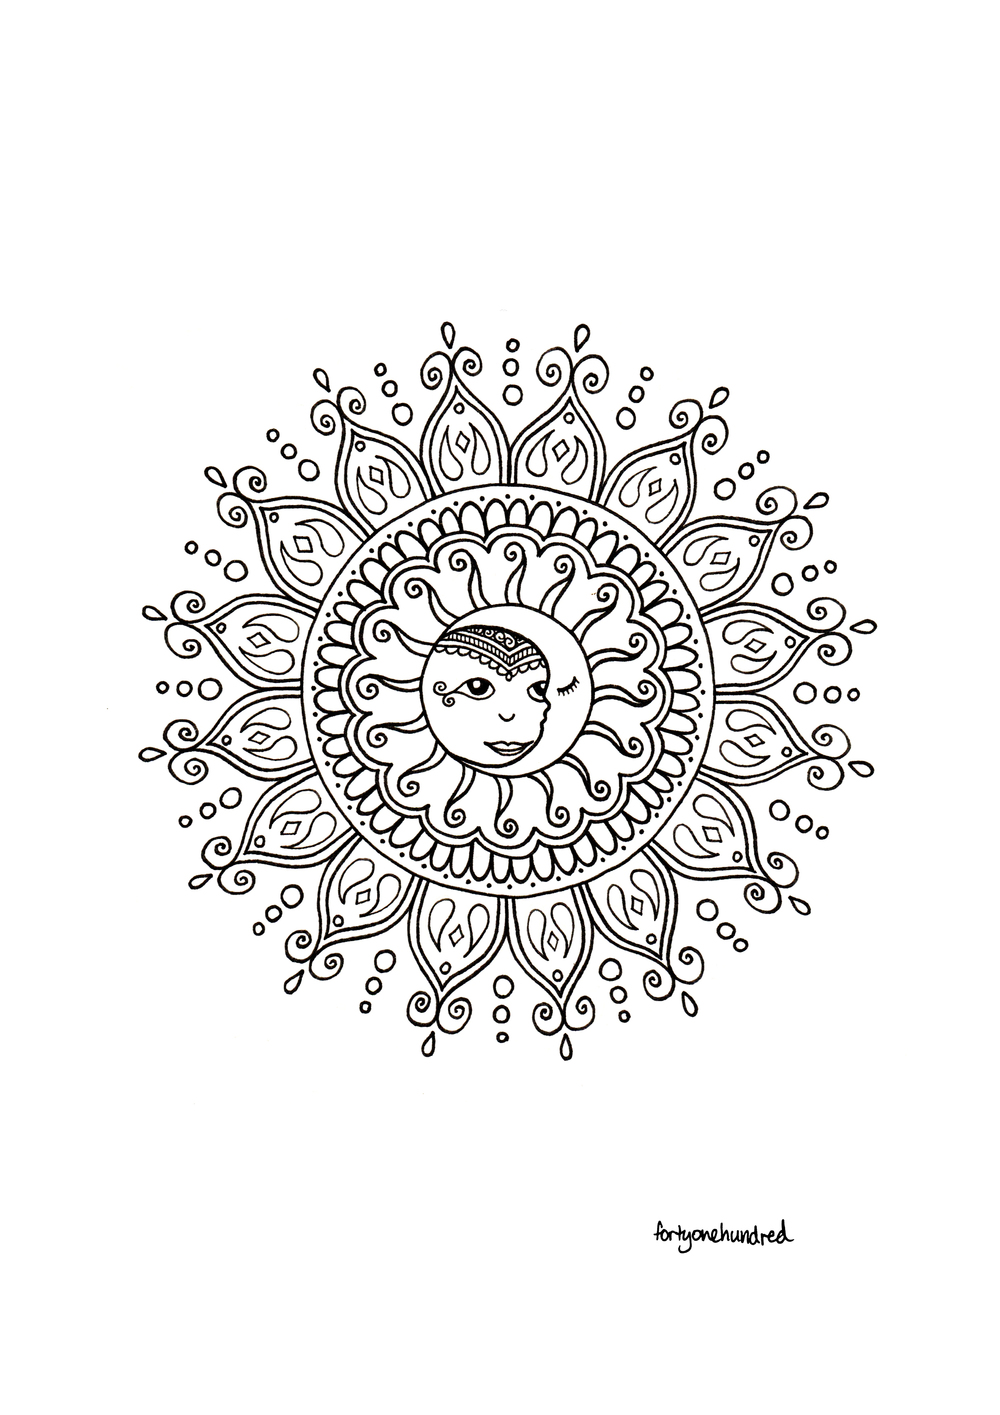 Amy - sun moon mandala - delicate.jpg